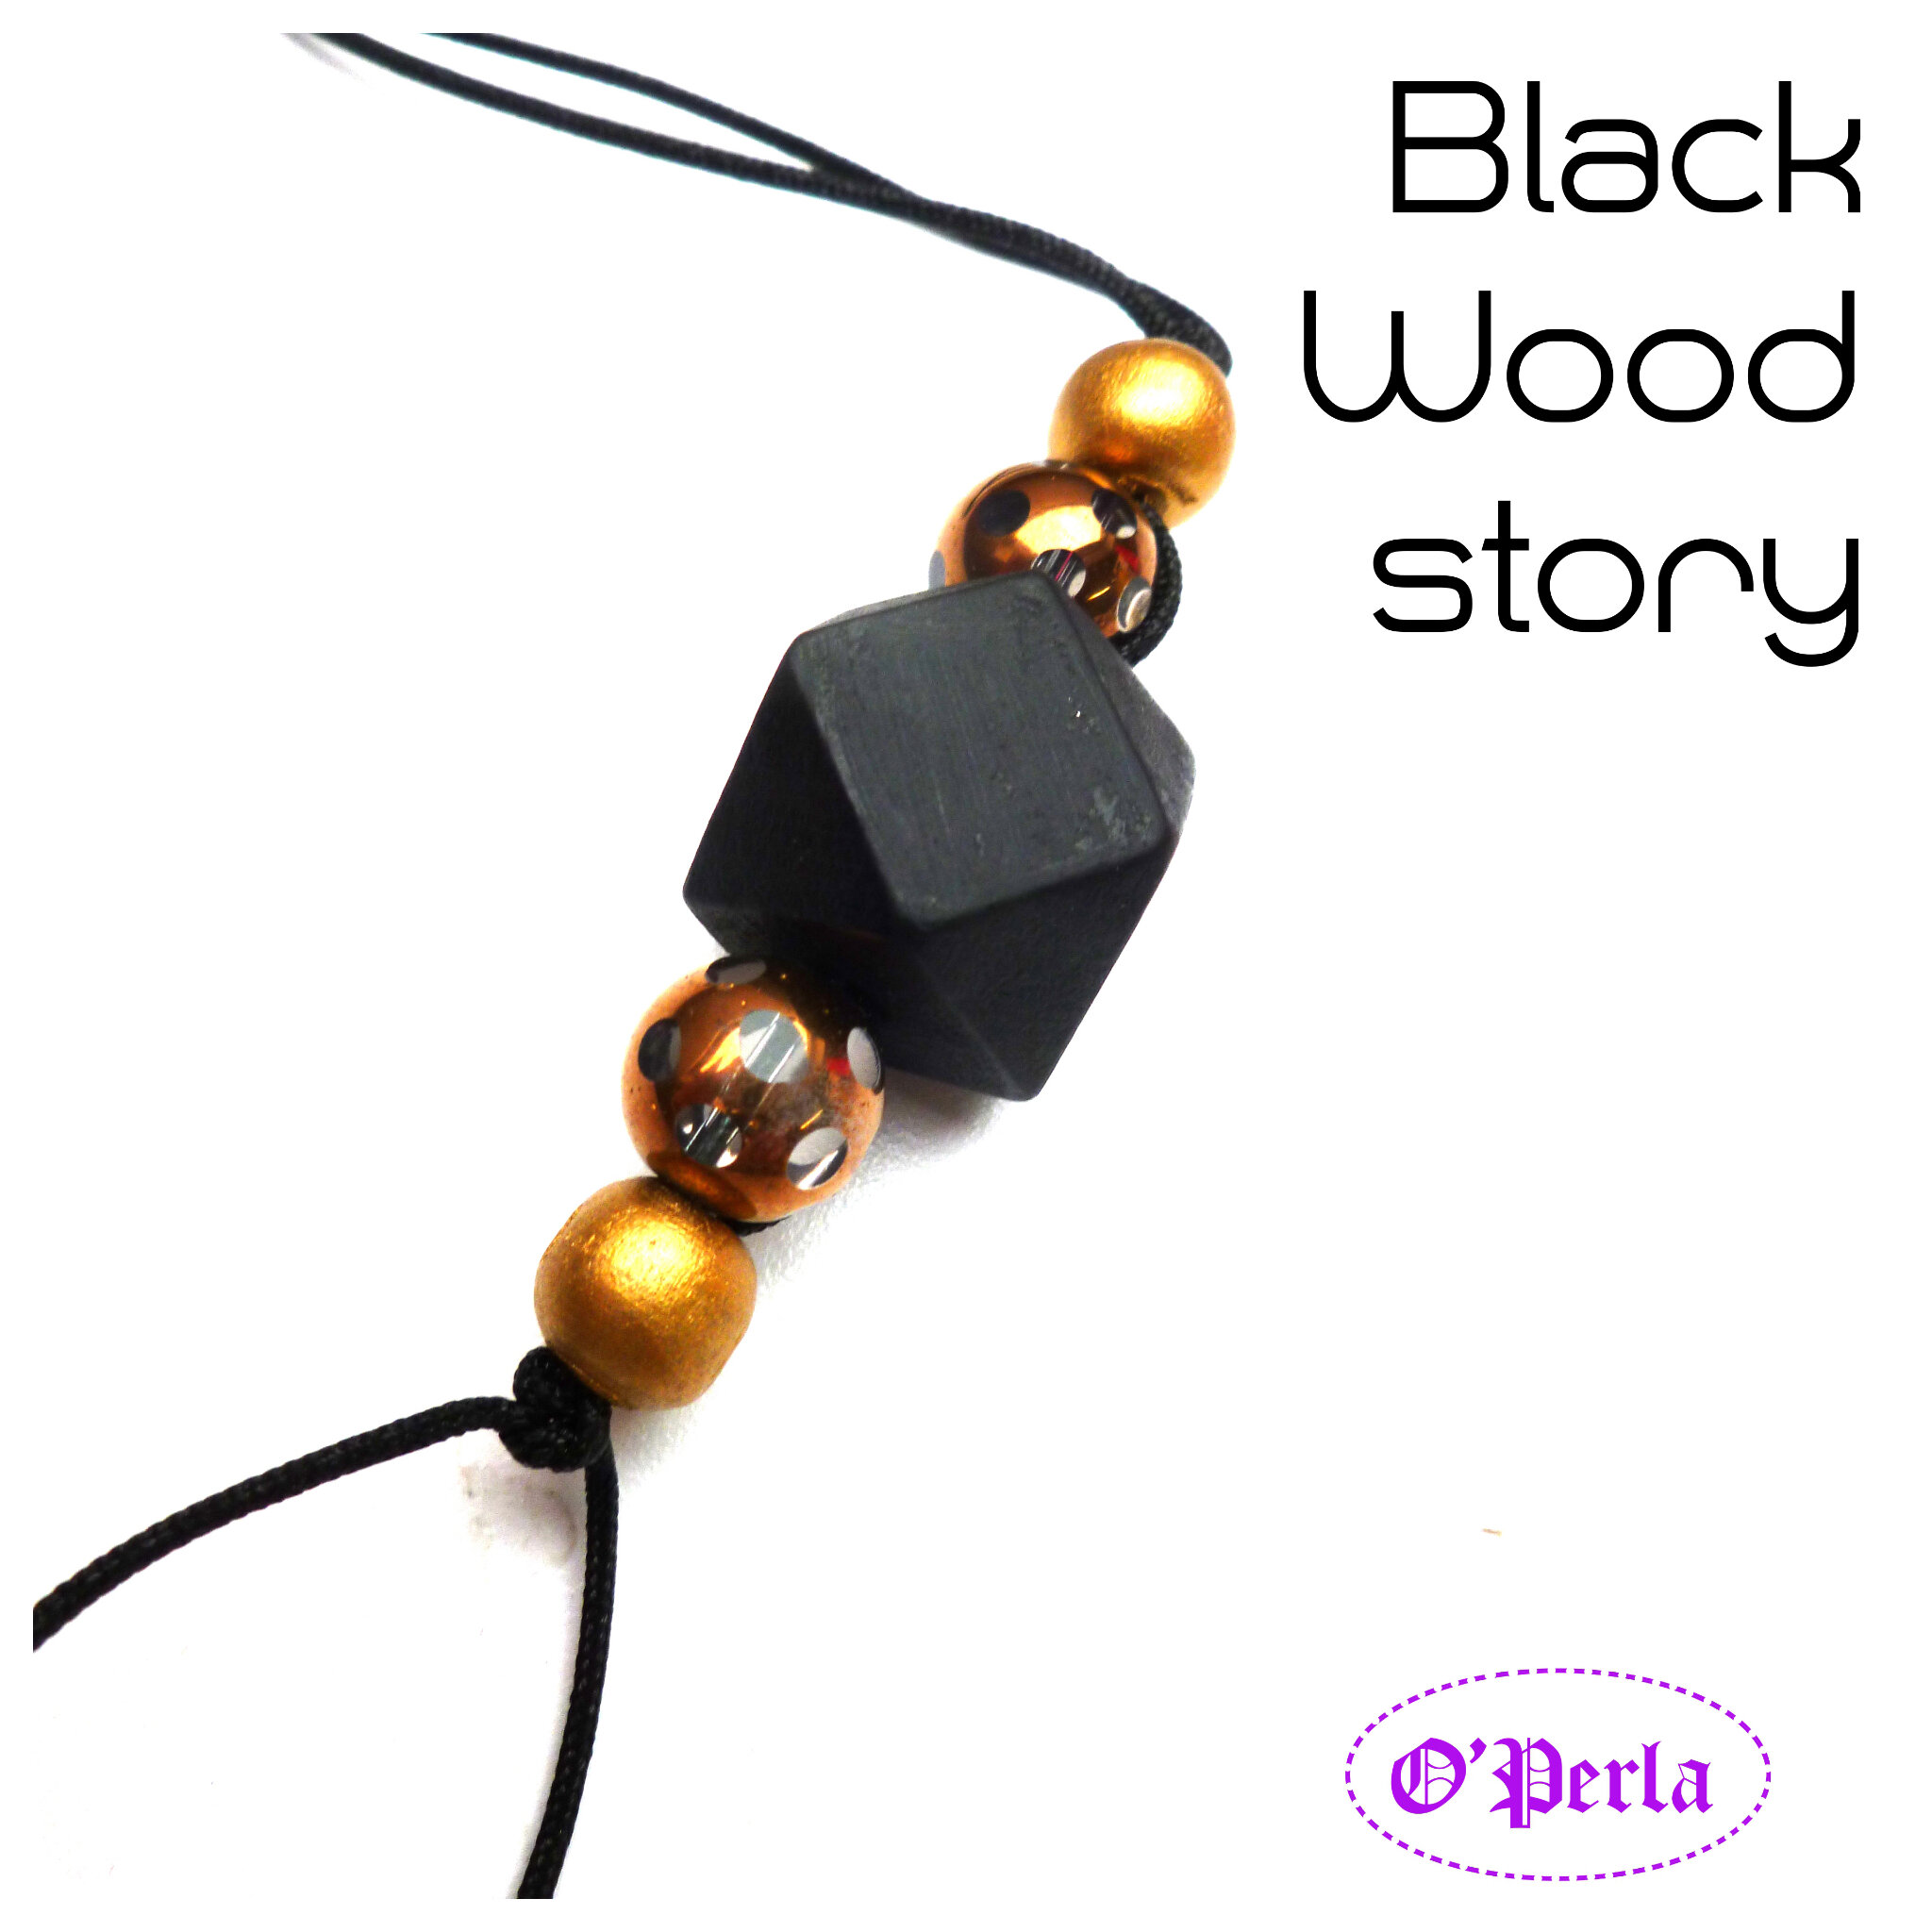 Black Wood Story...